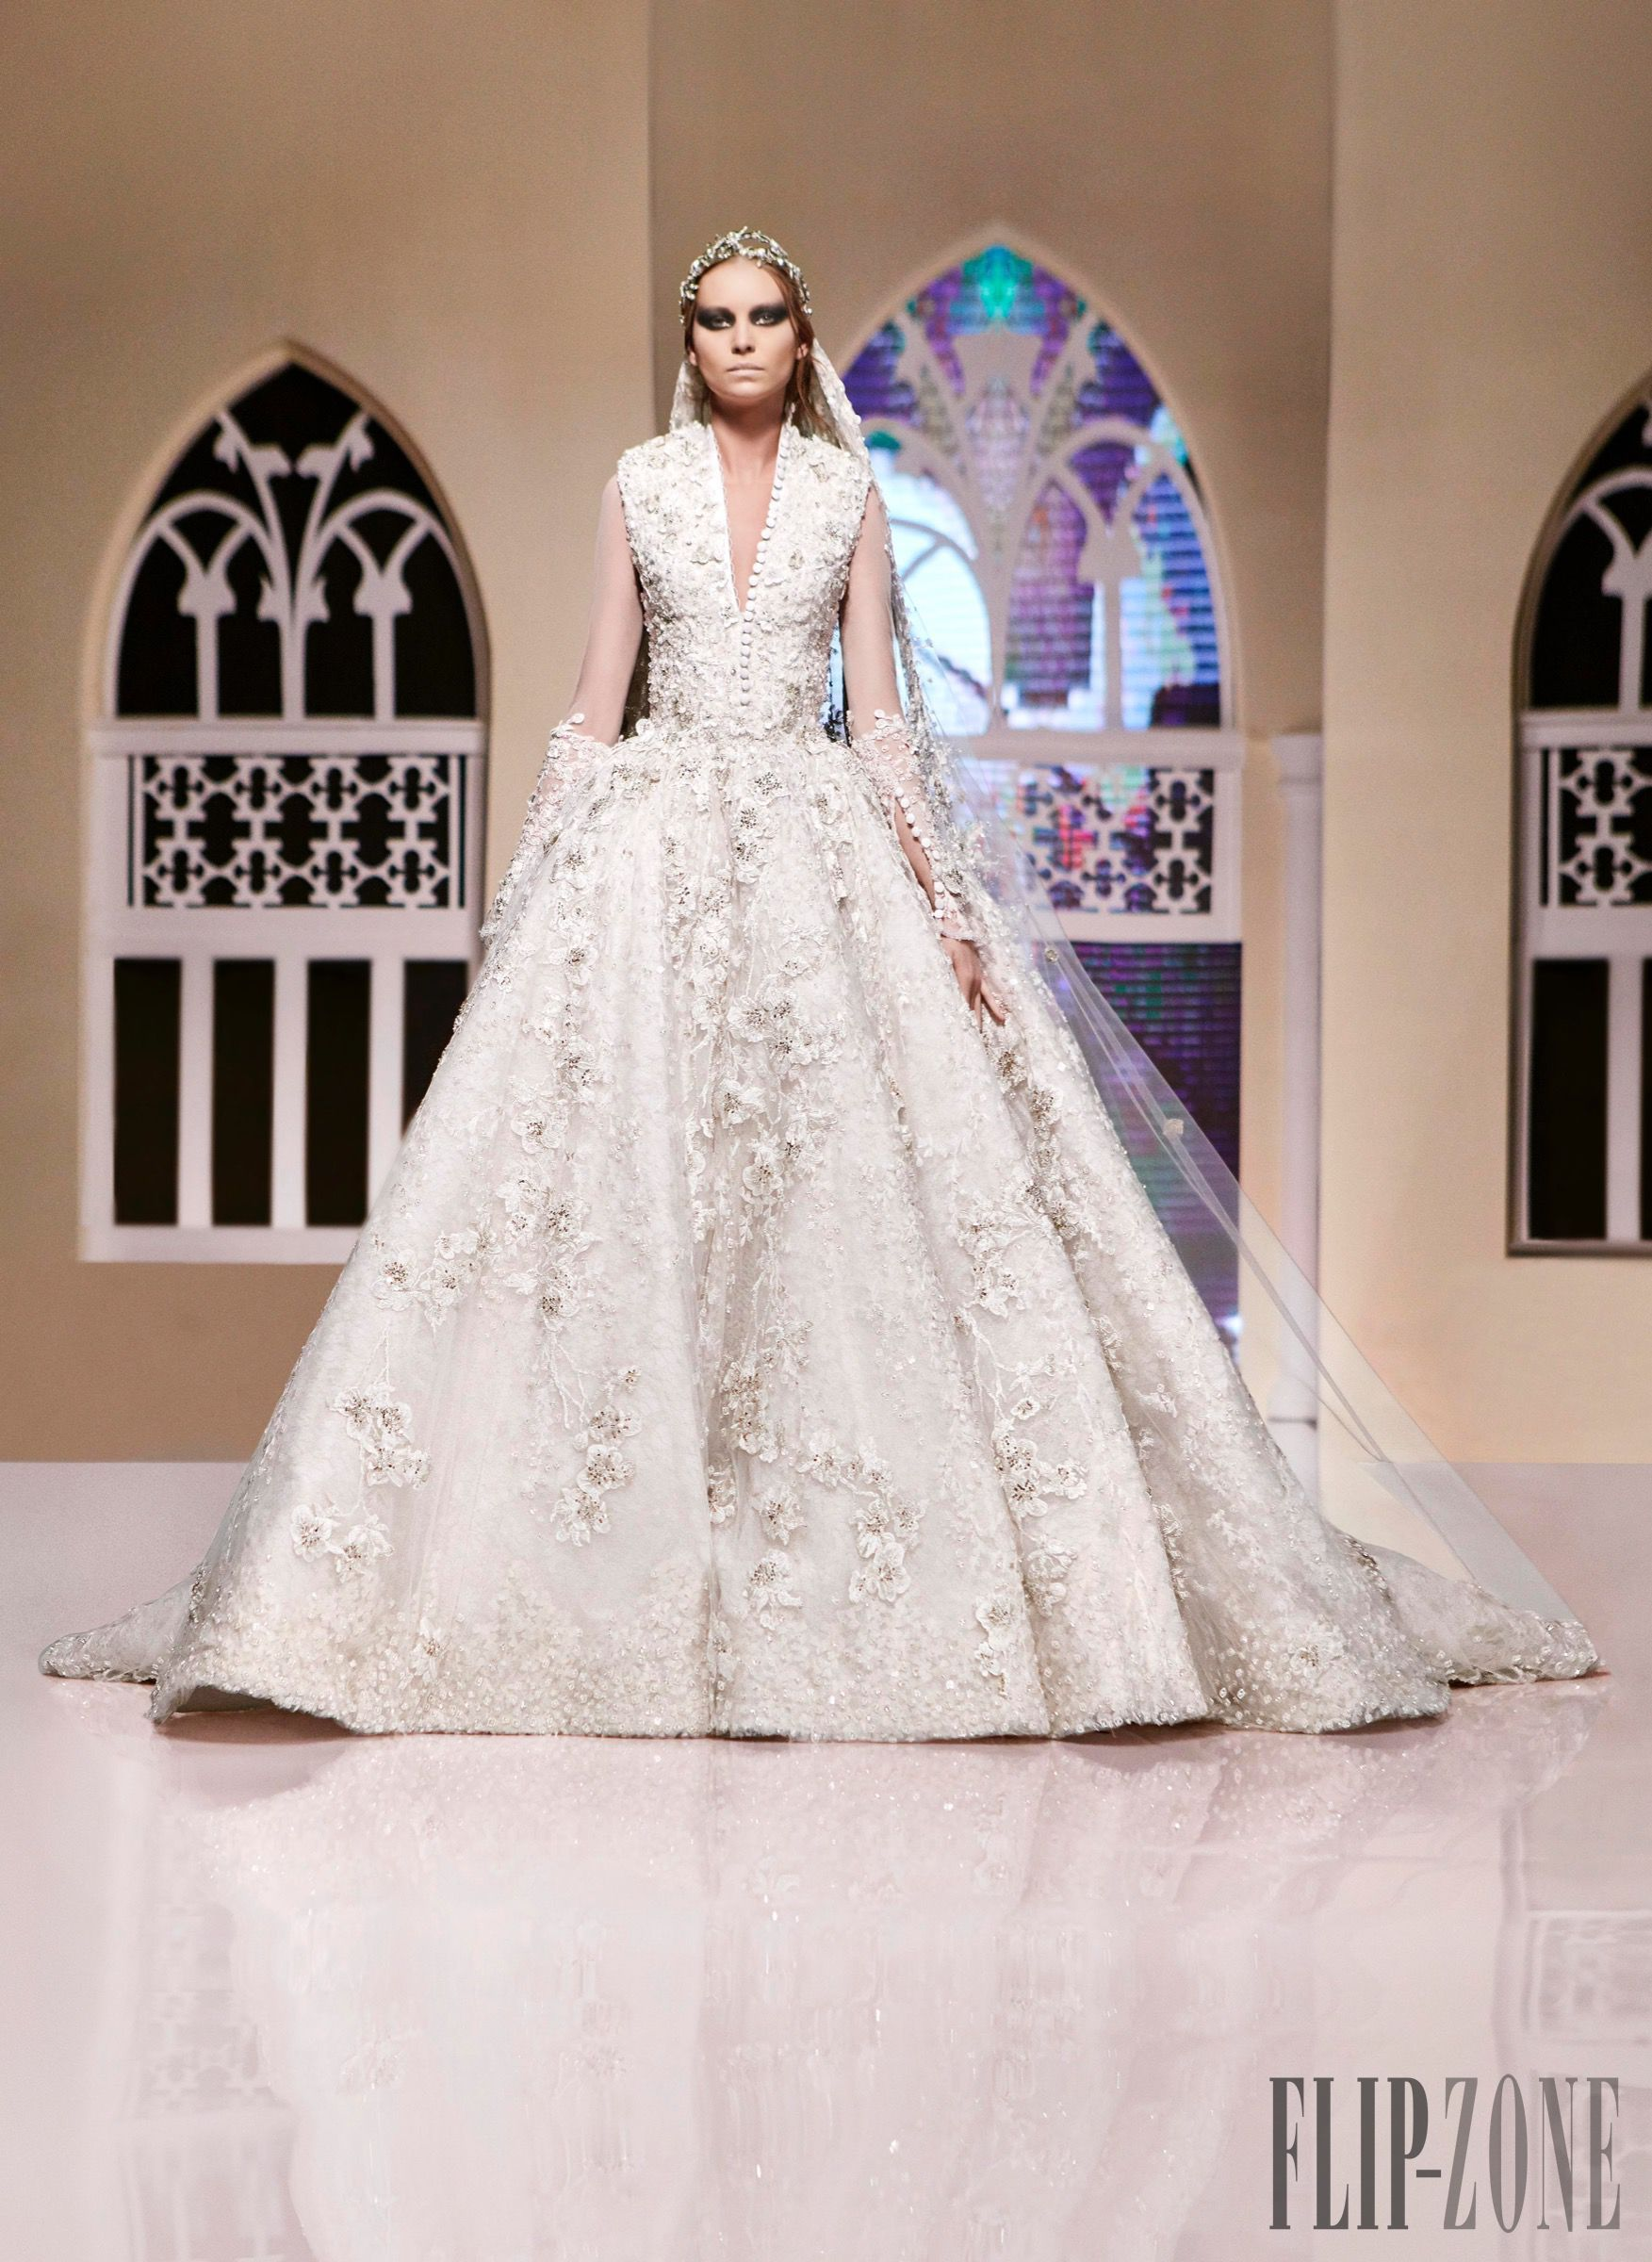 Shady Zeineldine 2016 collection - Couture - http://www.flip-zone.com/Shady-Zeineldine